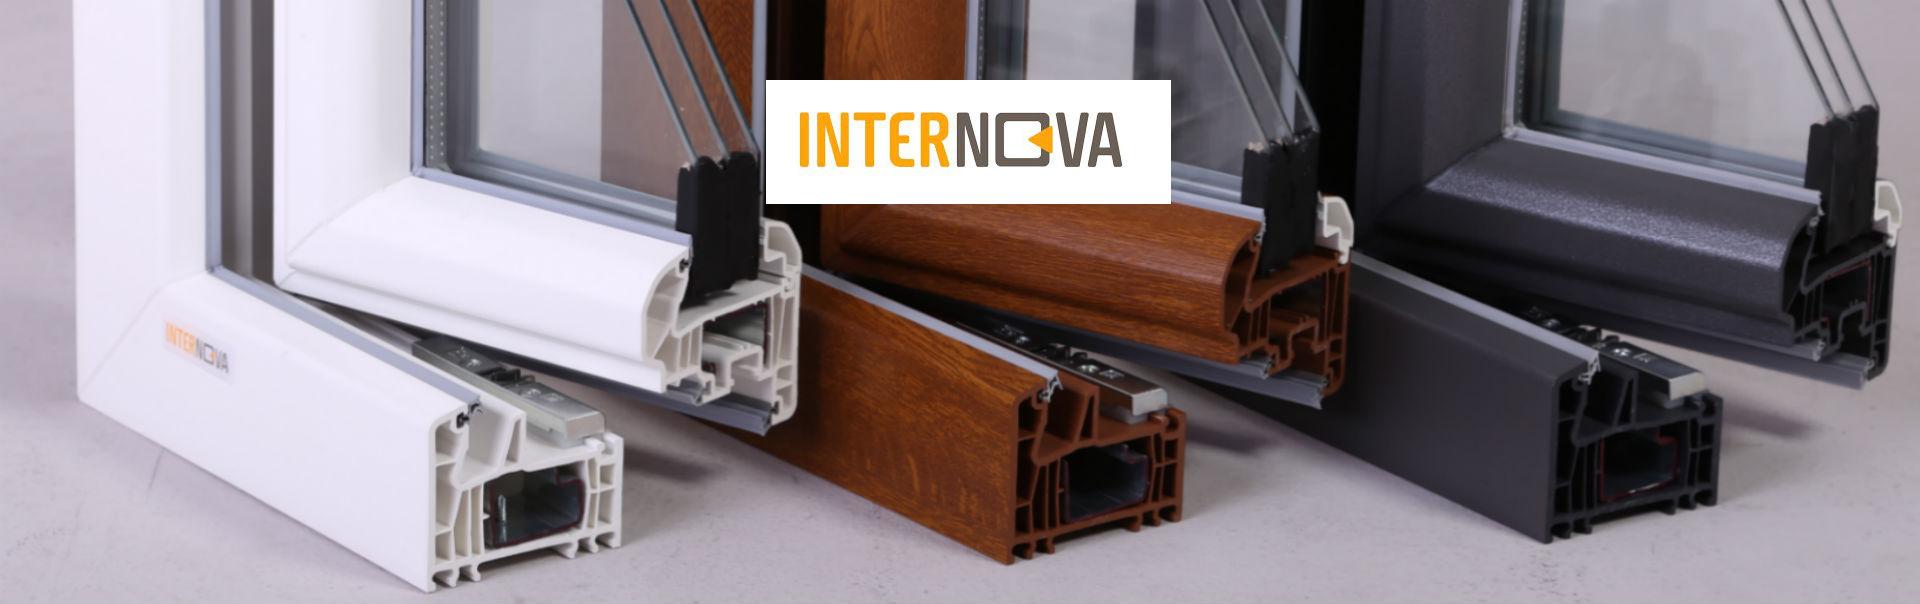 PVC INTERNOVA 6000